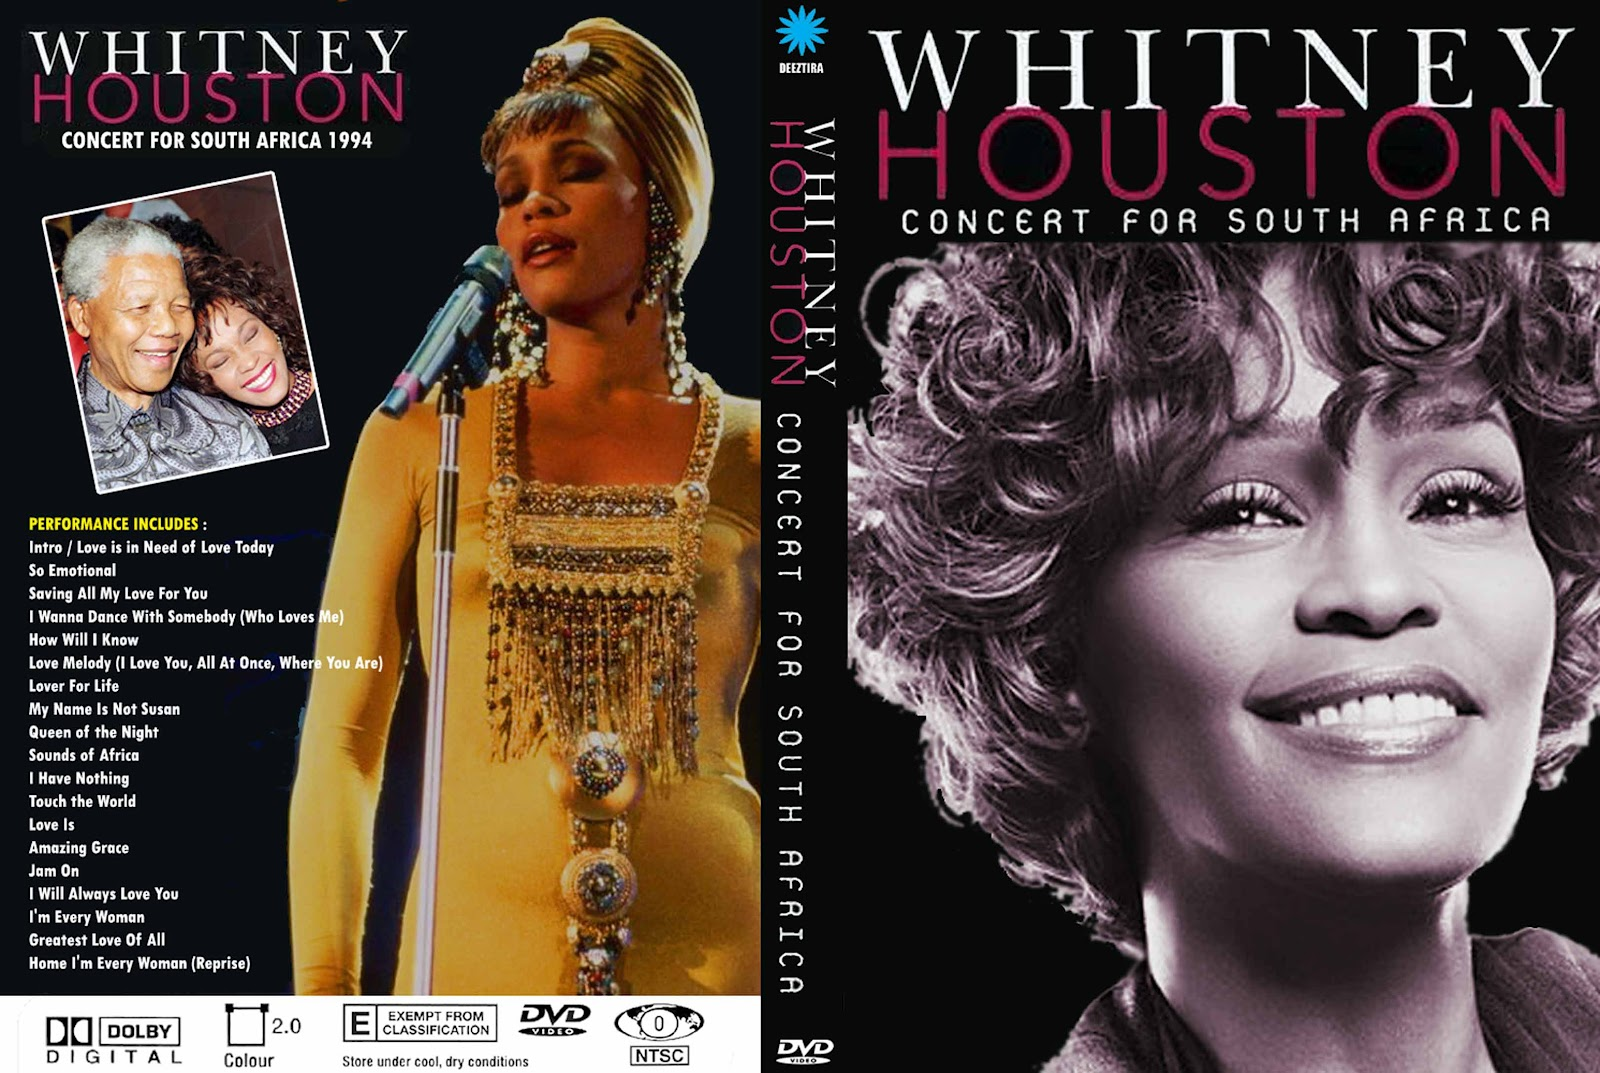 http://2.bp.blogspot.com/-0dPitjw0H-o/UC-xOYiD5pI/AAAAAAAAAX4/85NsJeYw1-c/s1600/WHITNEY+HOUSTON+-+Live+in+South+Africa+1994.jpg